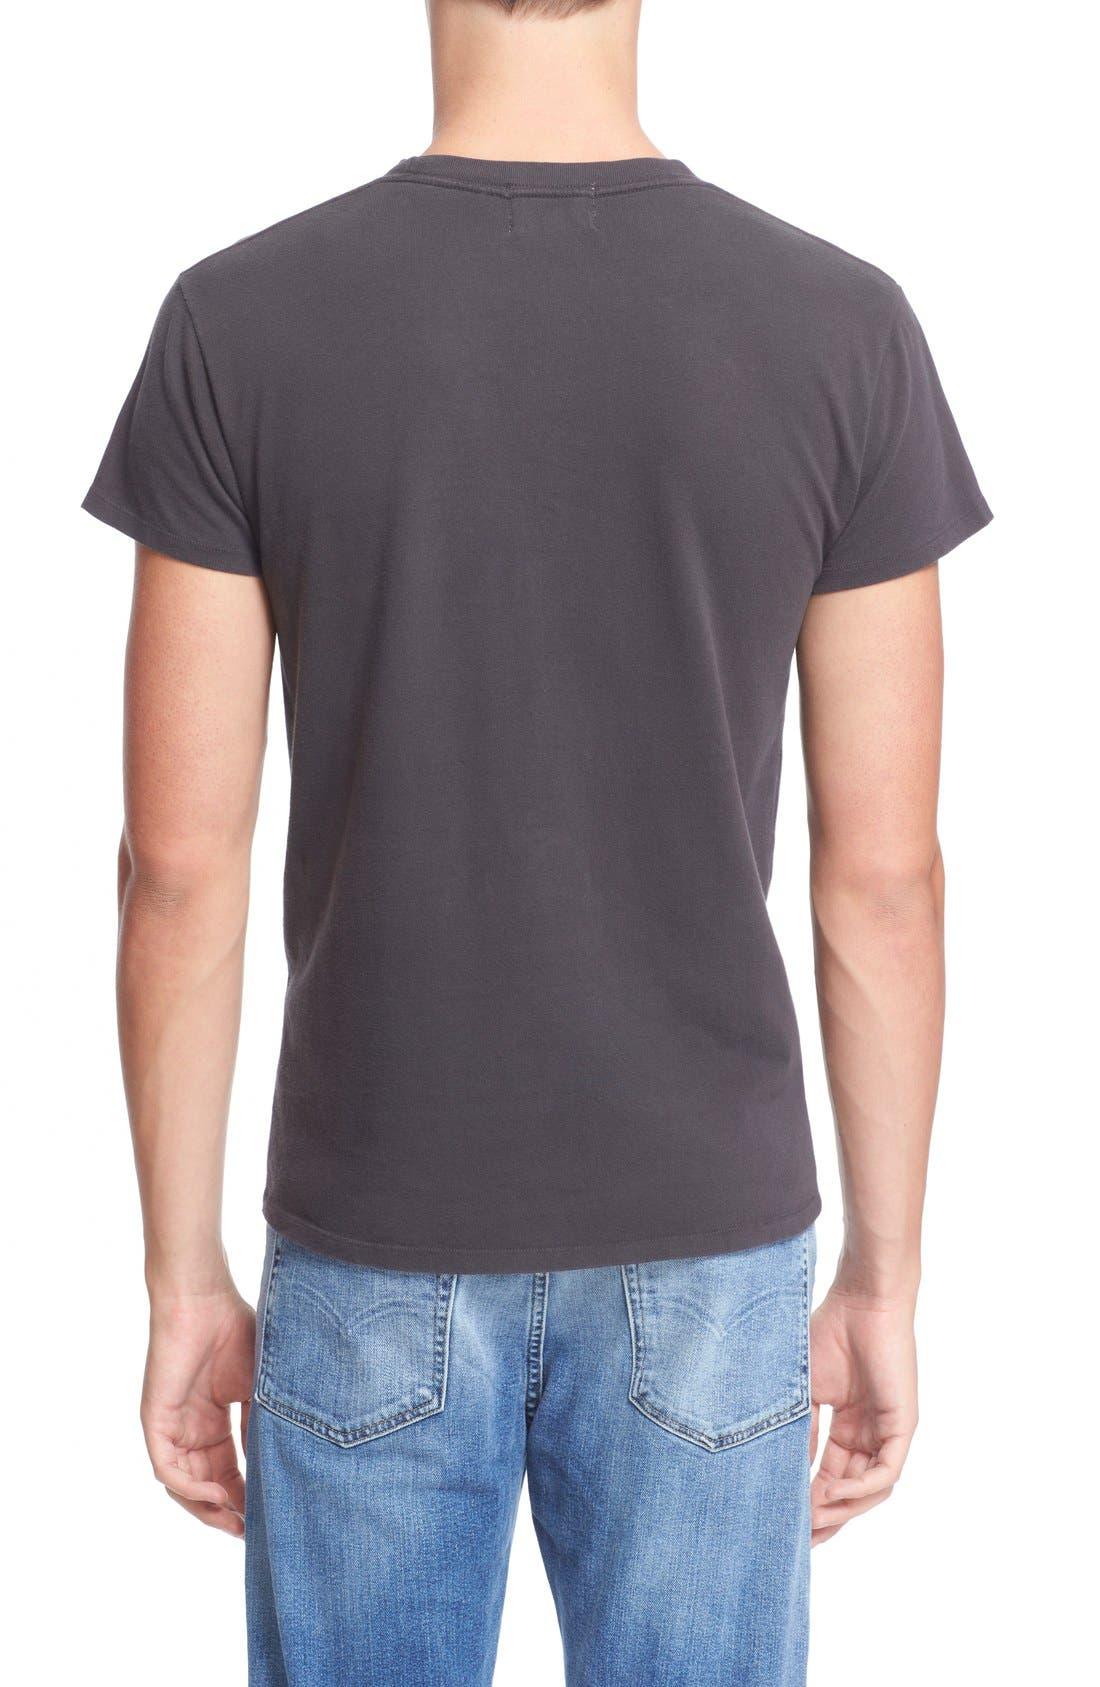 Levi's Vintage Clothing '1950s' Pocket T-Shirt,                             Alternate thumbnail 2, color,                             Black